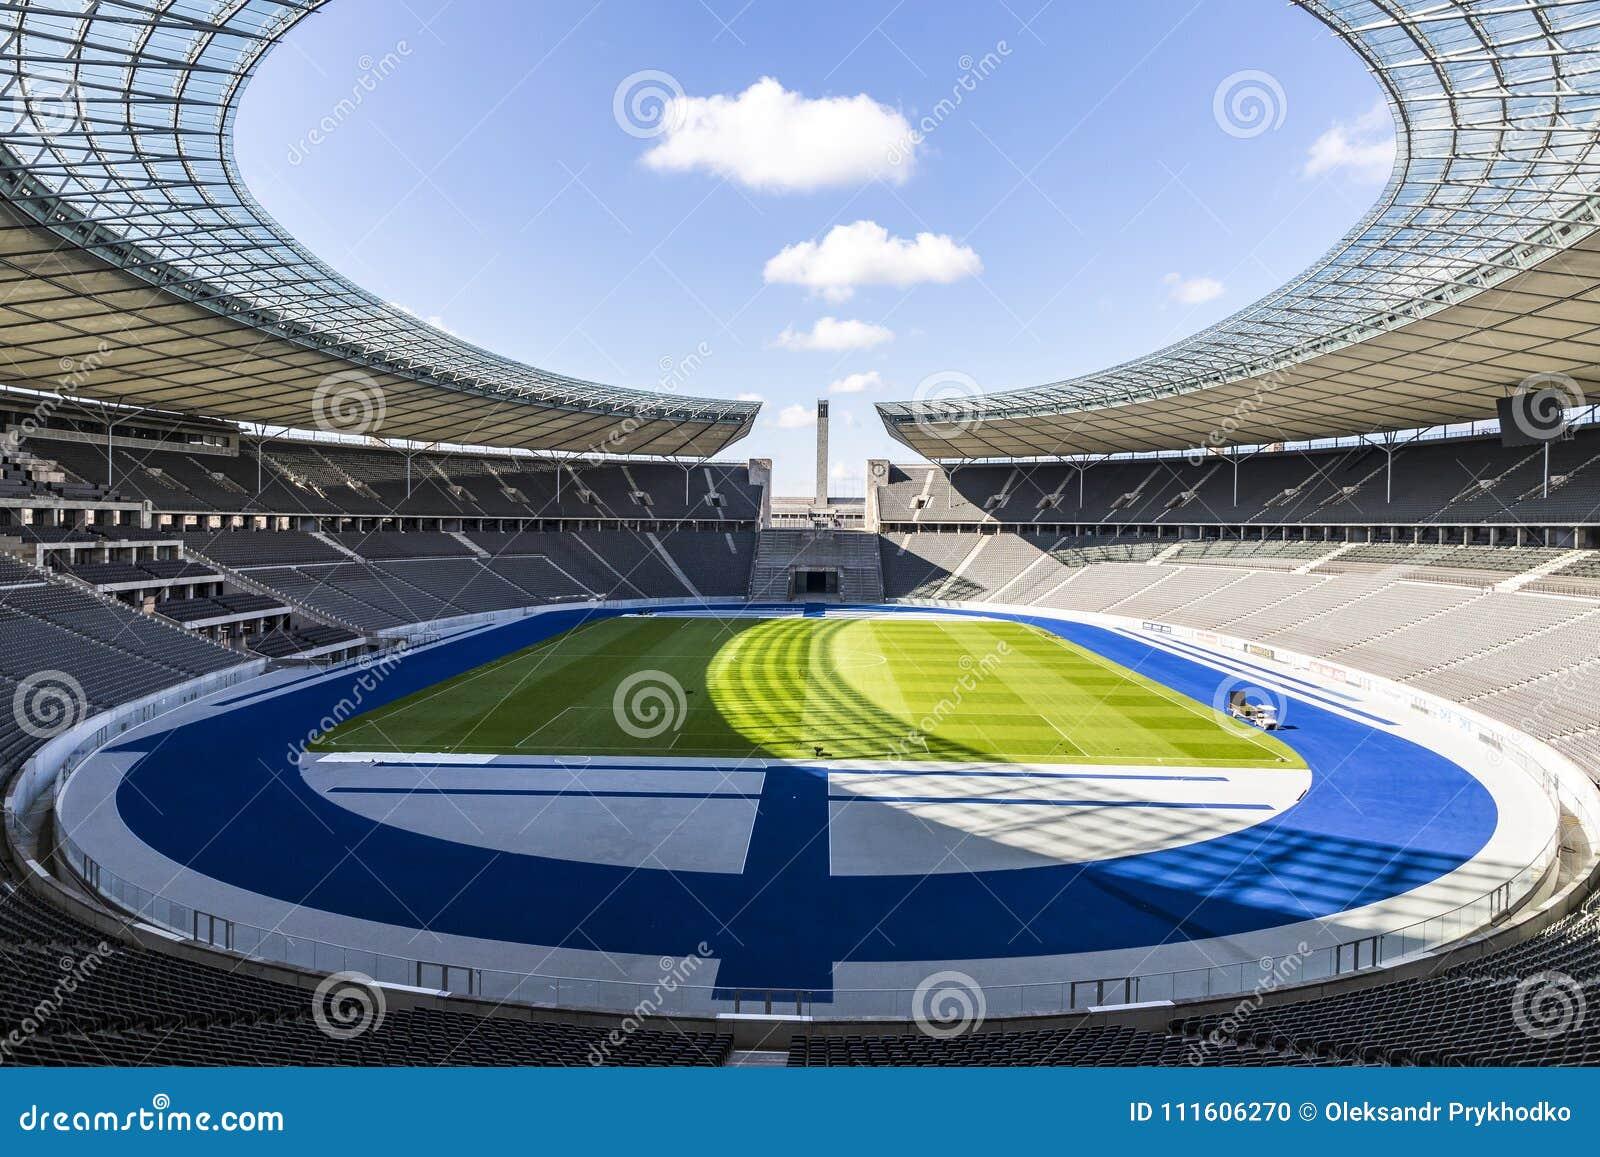 Shop für Beamte abholen Herbst Schuhe Olympiastadion O Estádio Olímpico Em Berlim, Alemanha Imagem ...